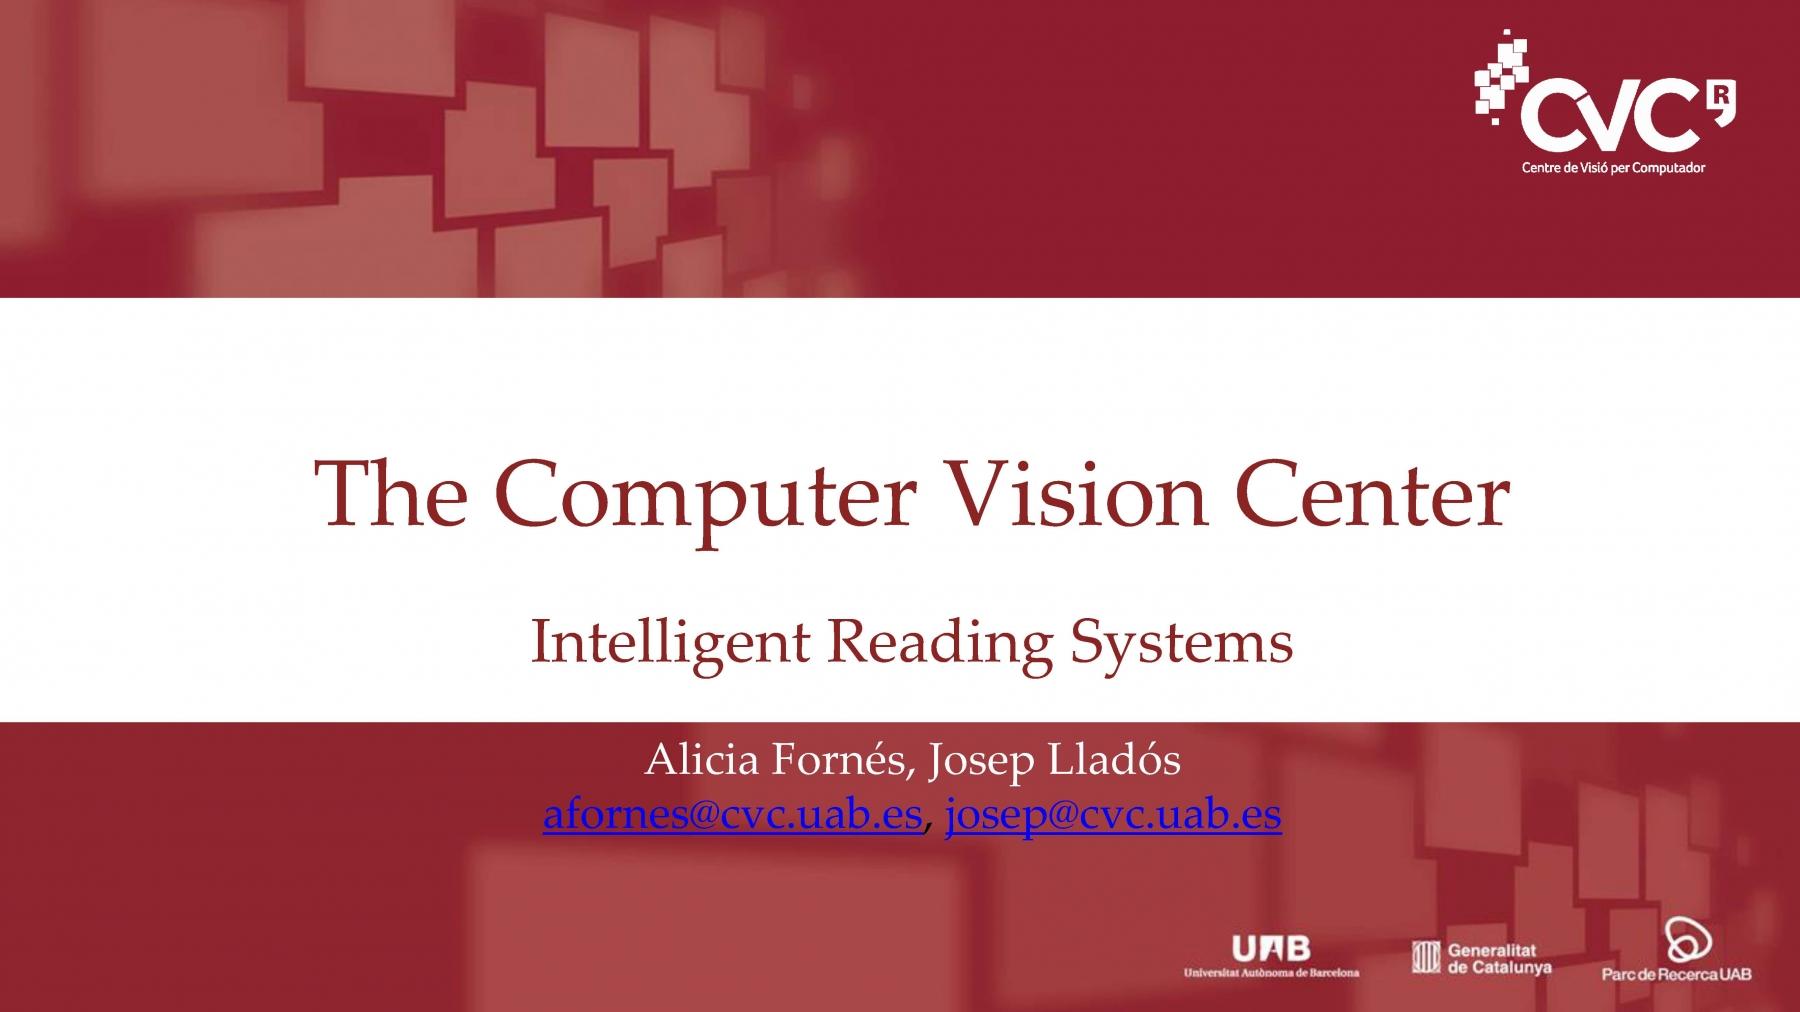 Computer Vision Center (pres. by Alicia Fornés)